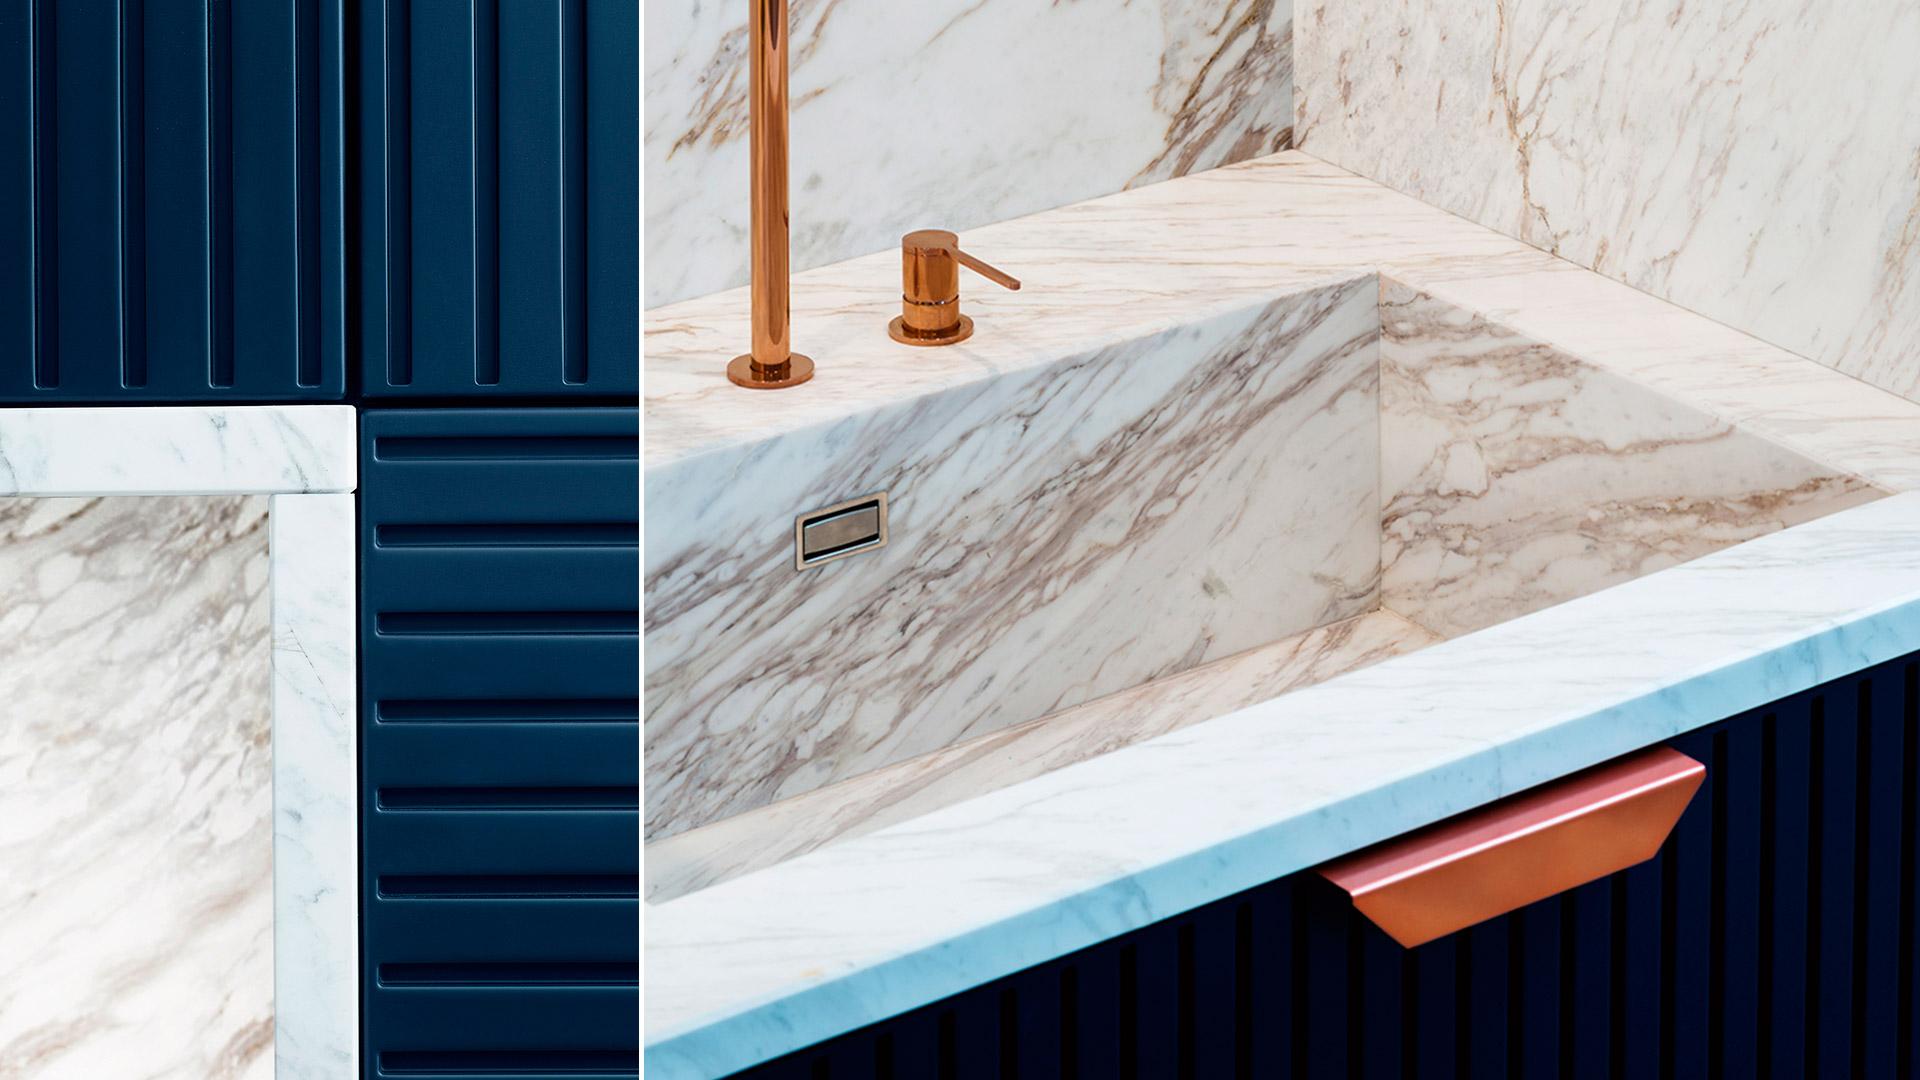 Stone kitchen with island or peninsula MIUCCIA | TM Italia 2018 Kitchens Collection - TM_CAT_MIU_003